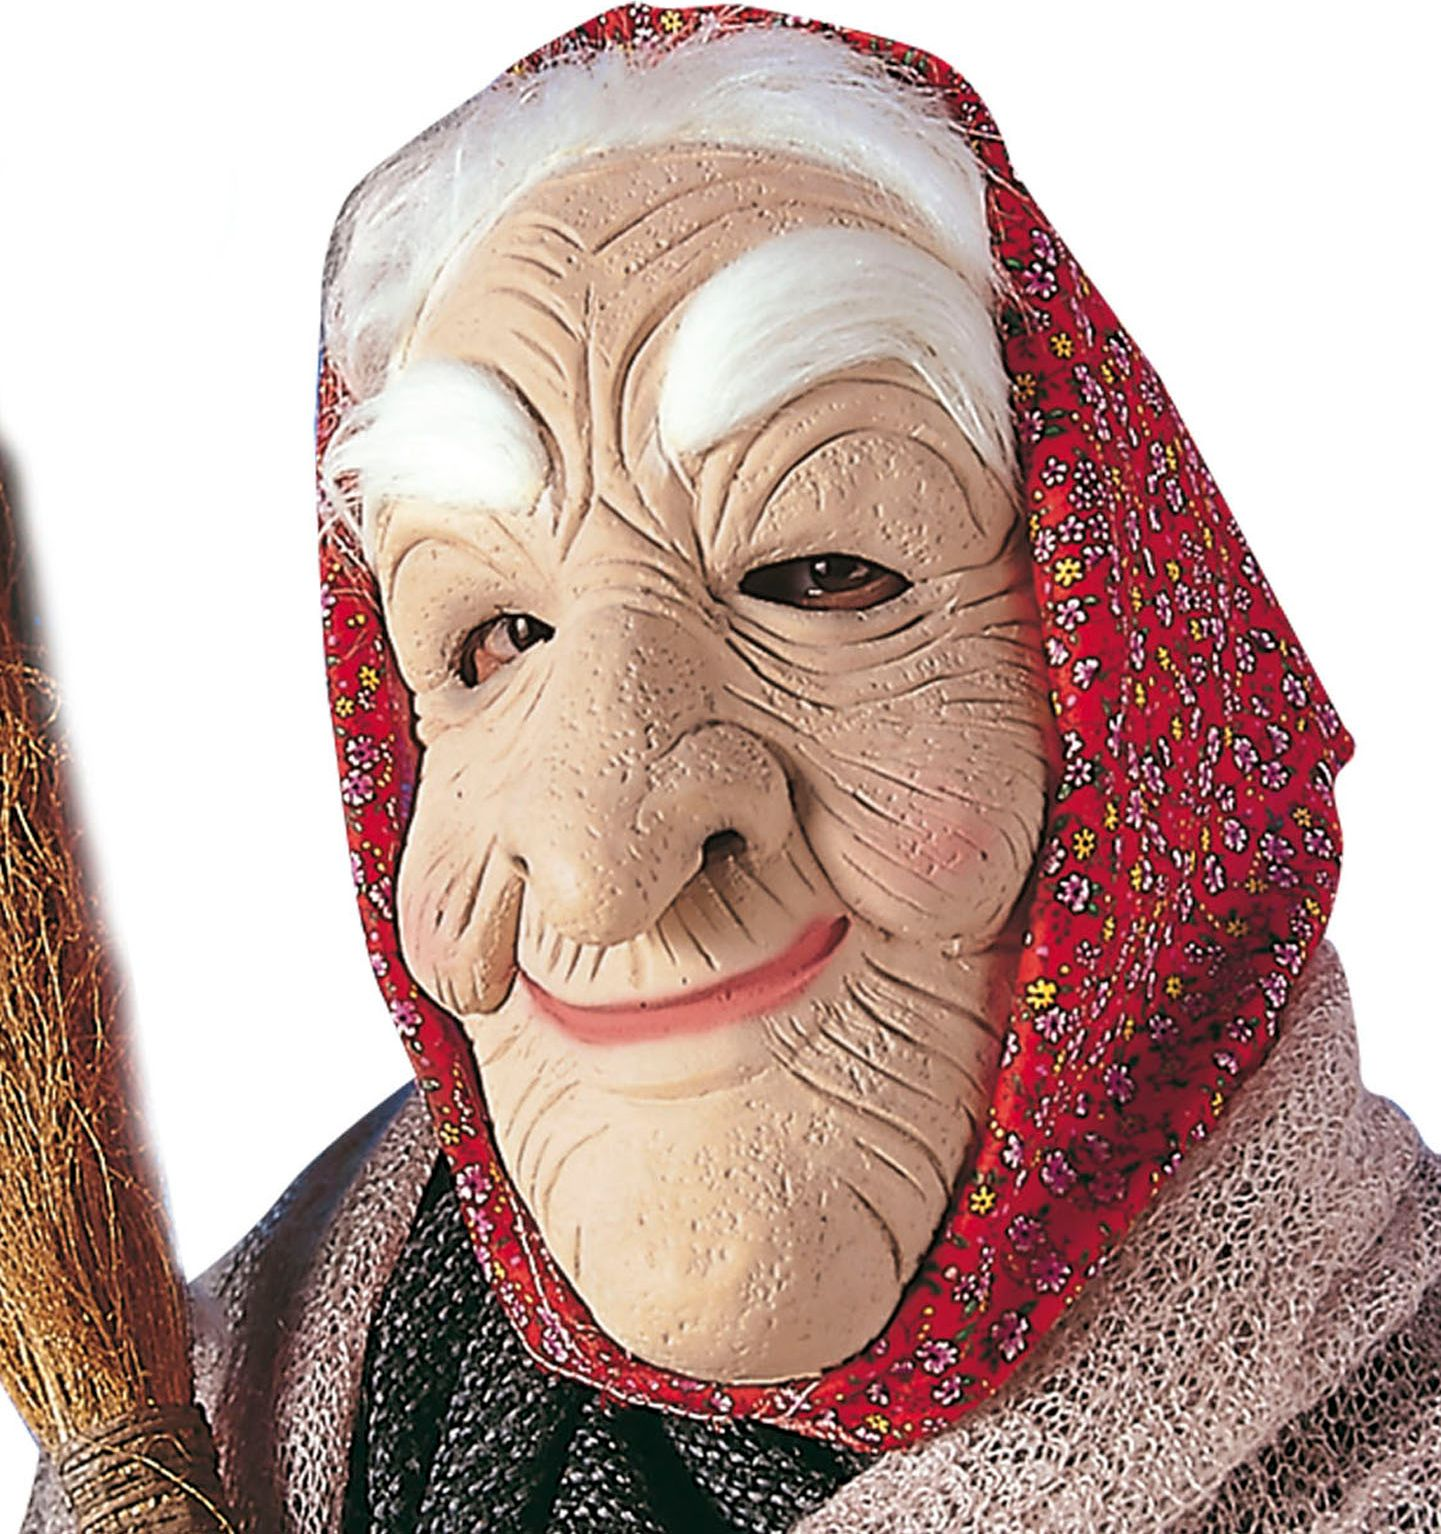 Driekoningen heksen masker